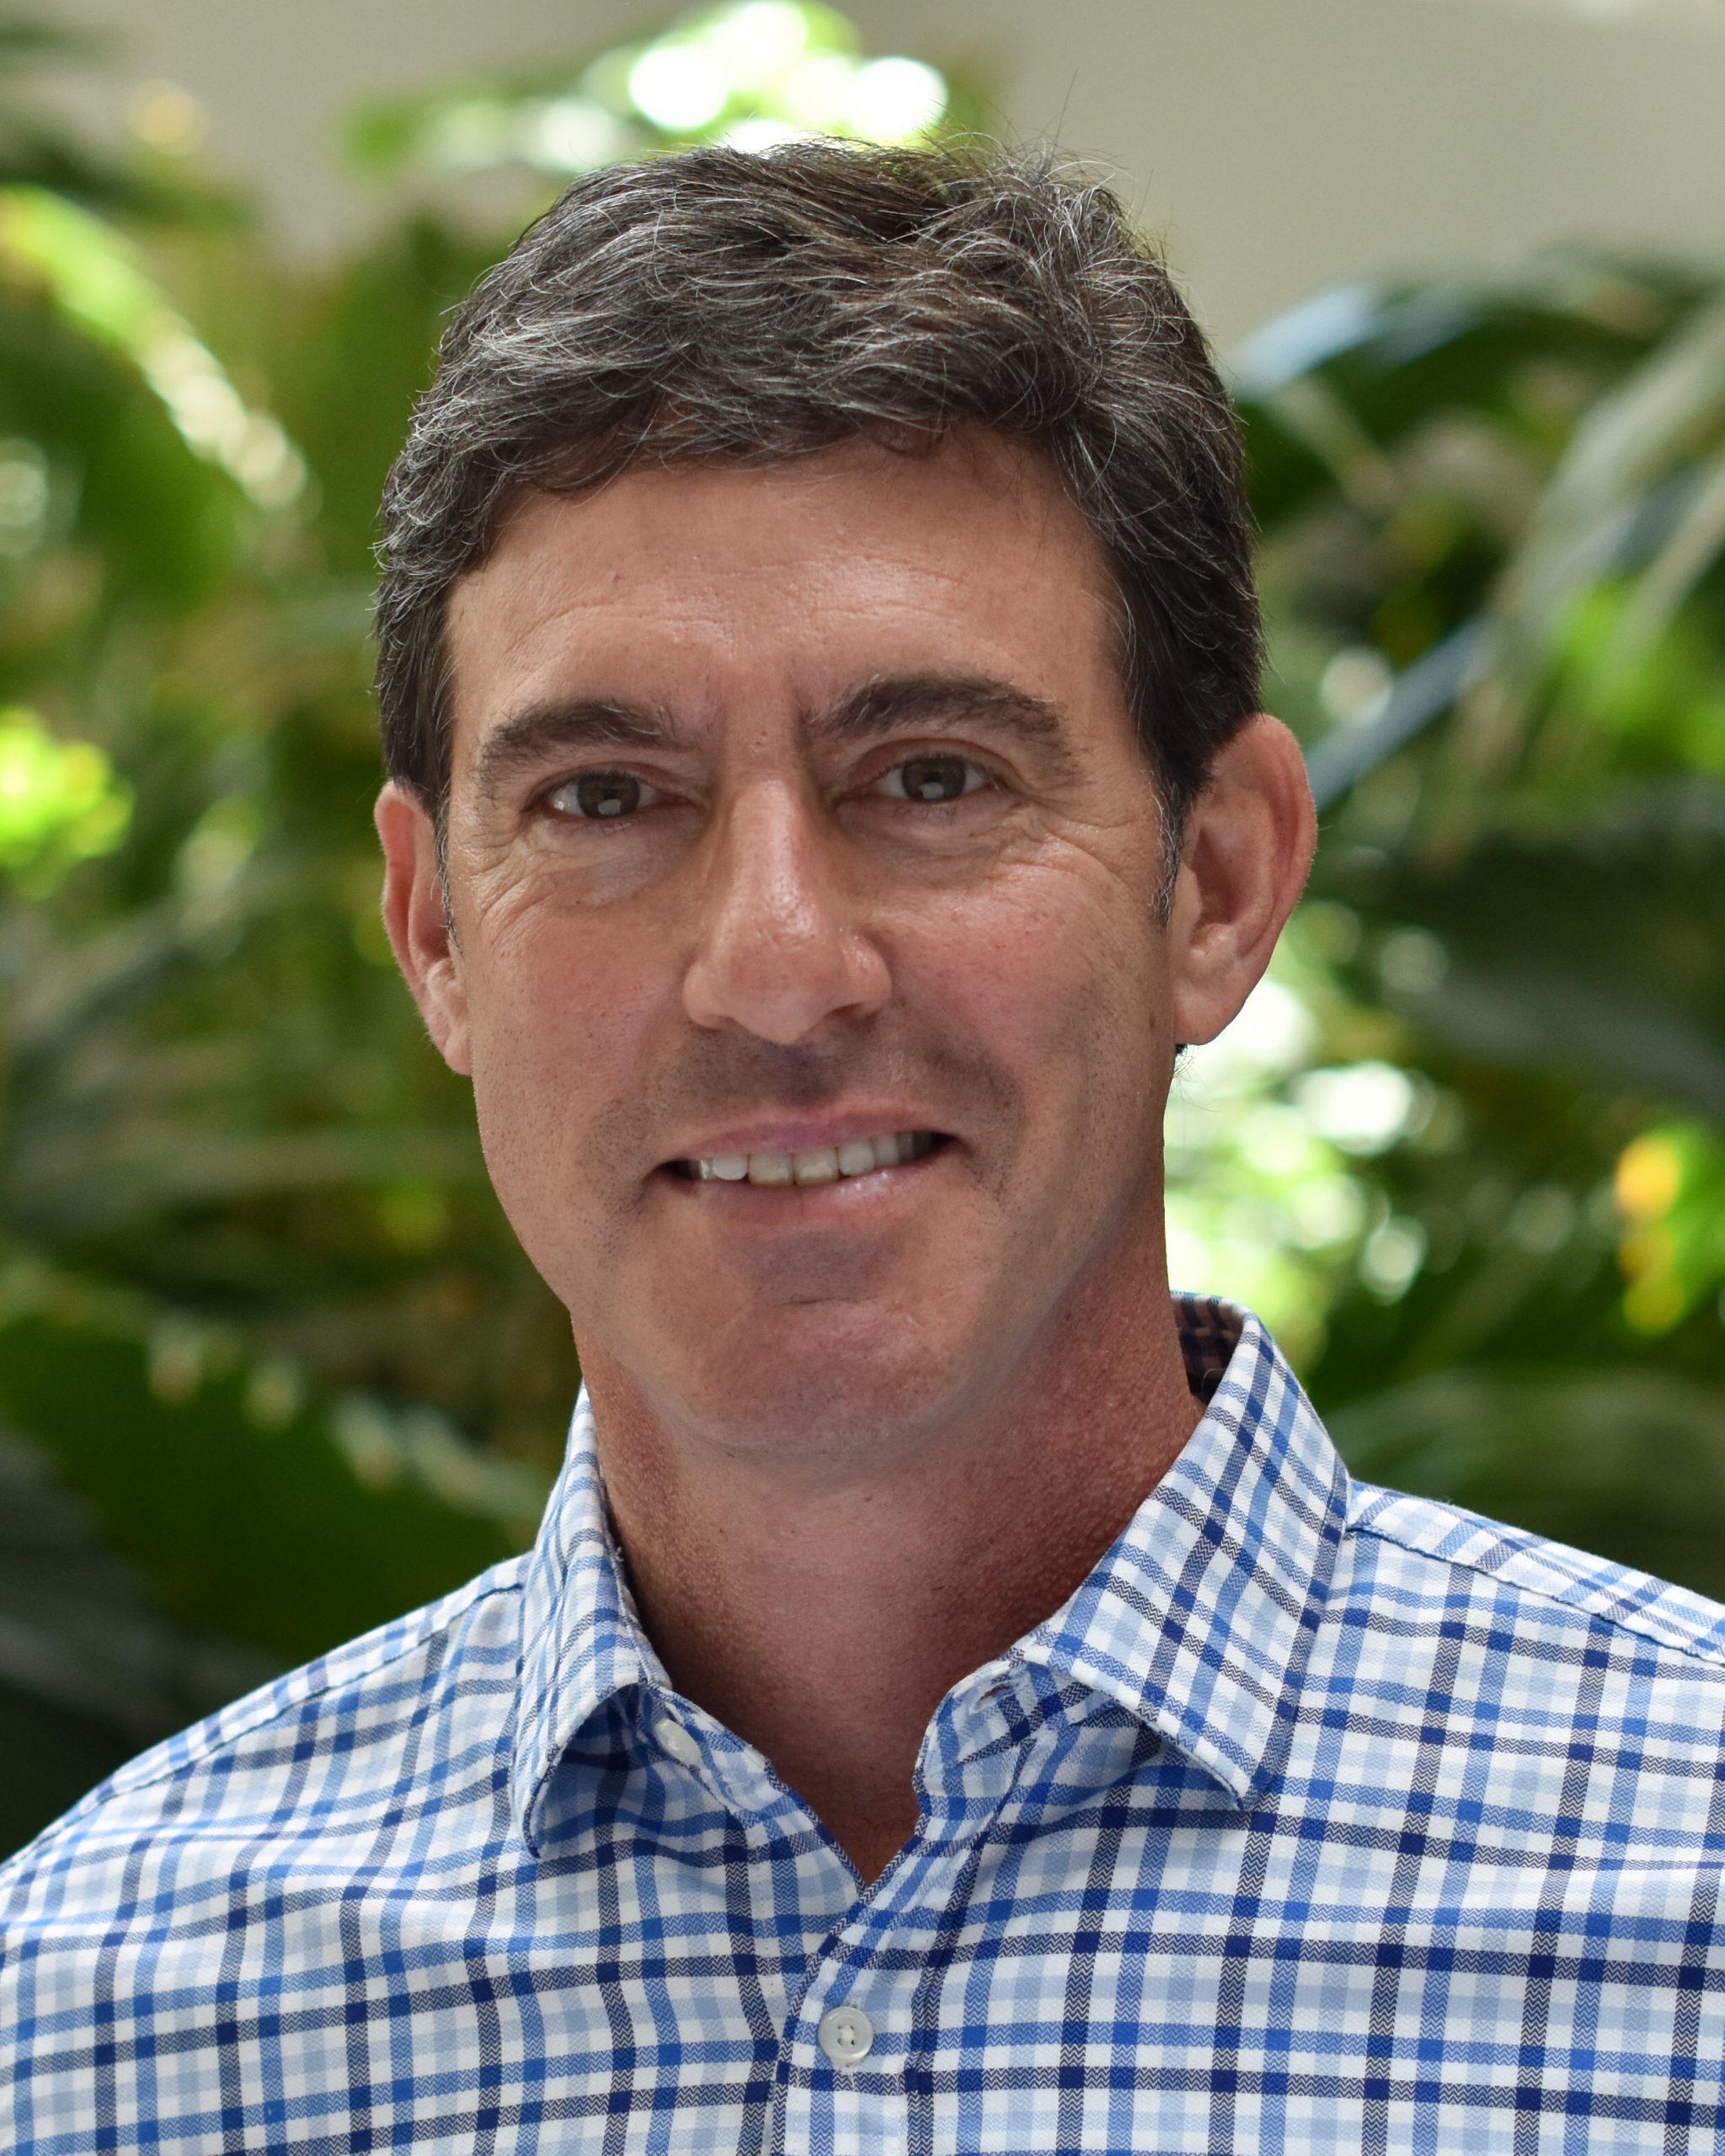 Rick Rhyner